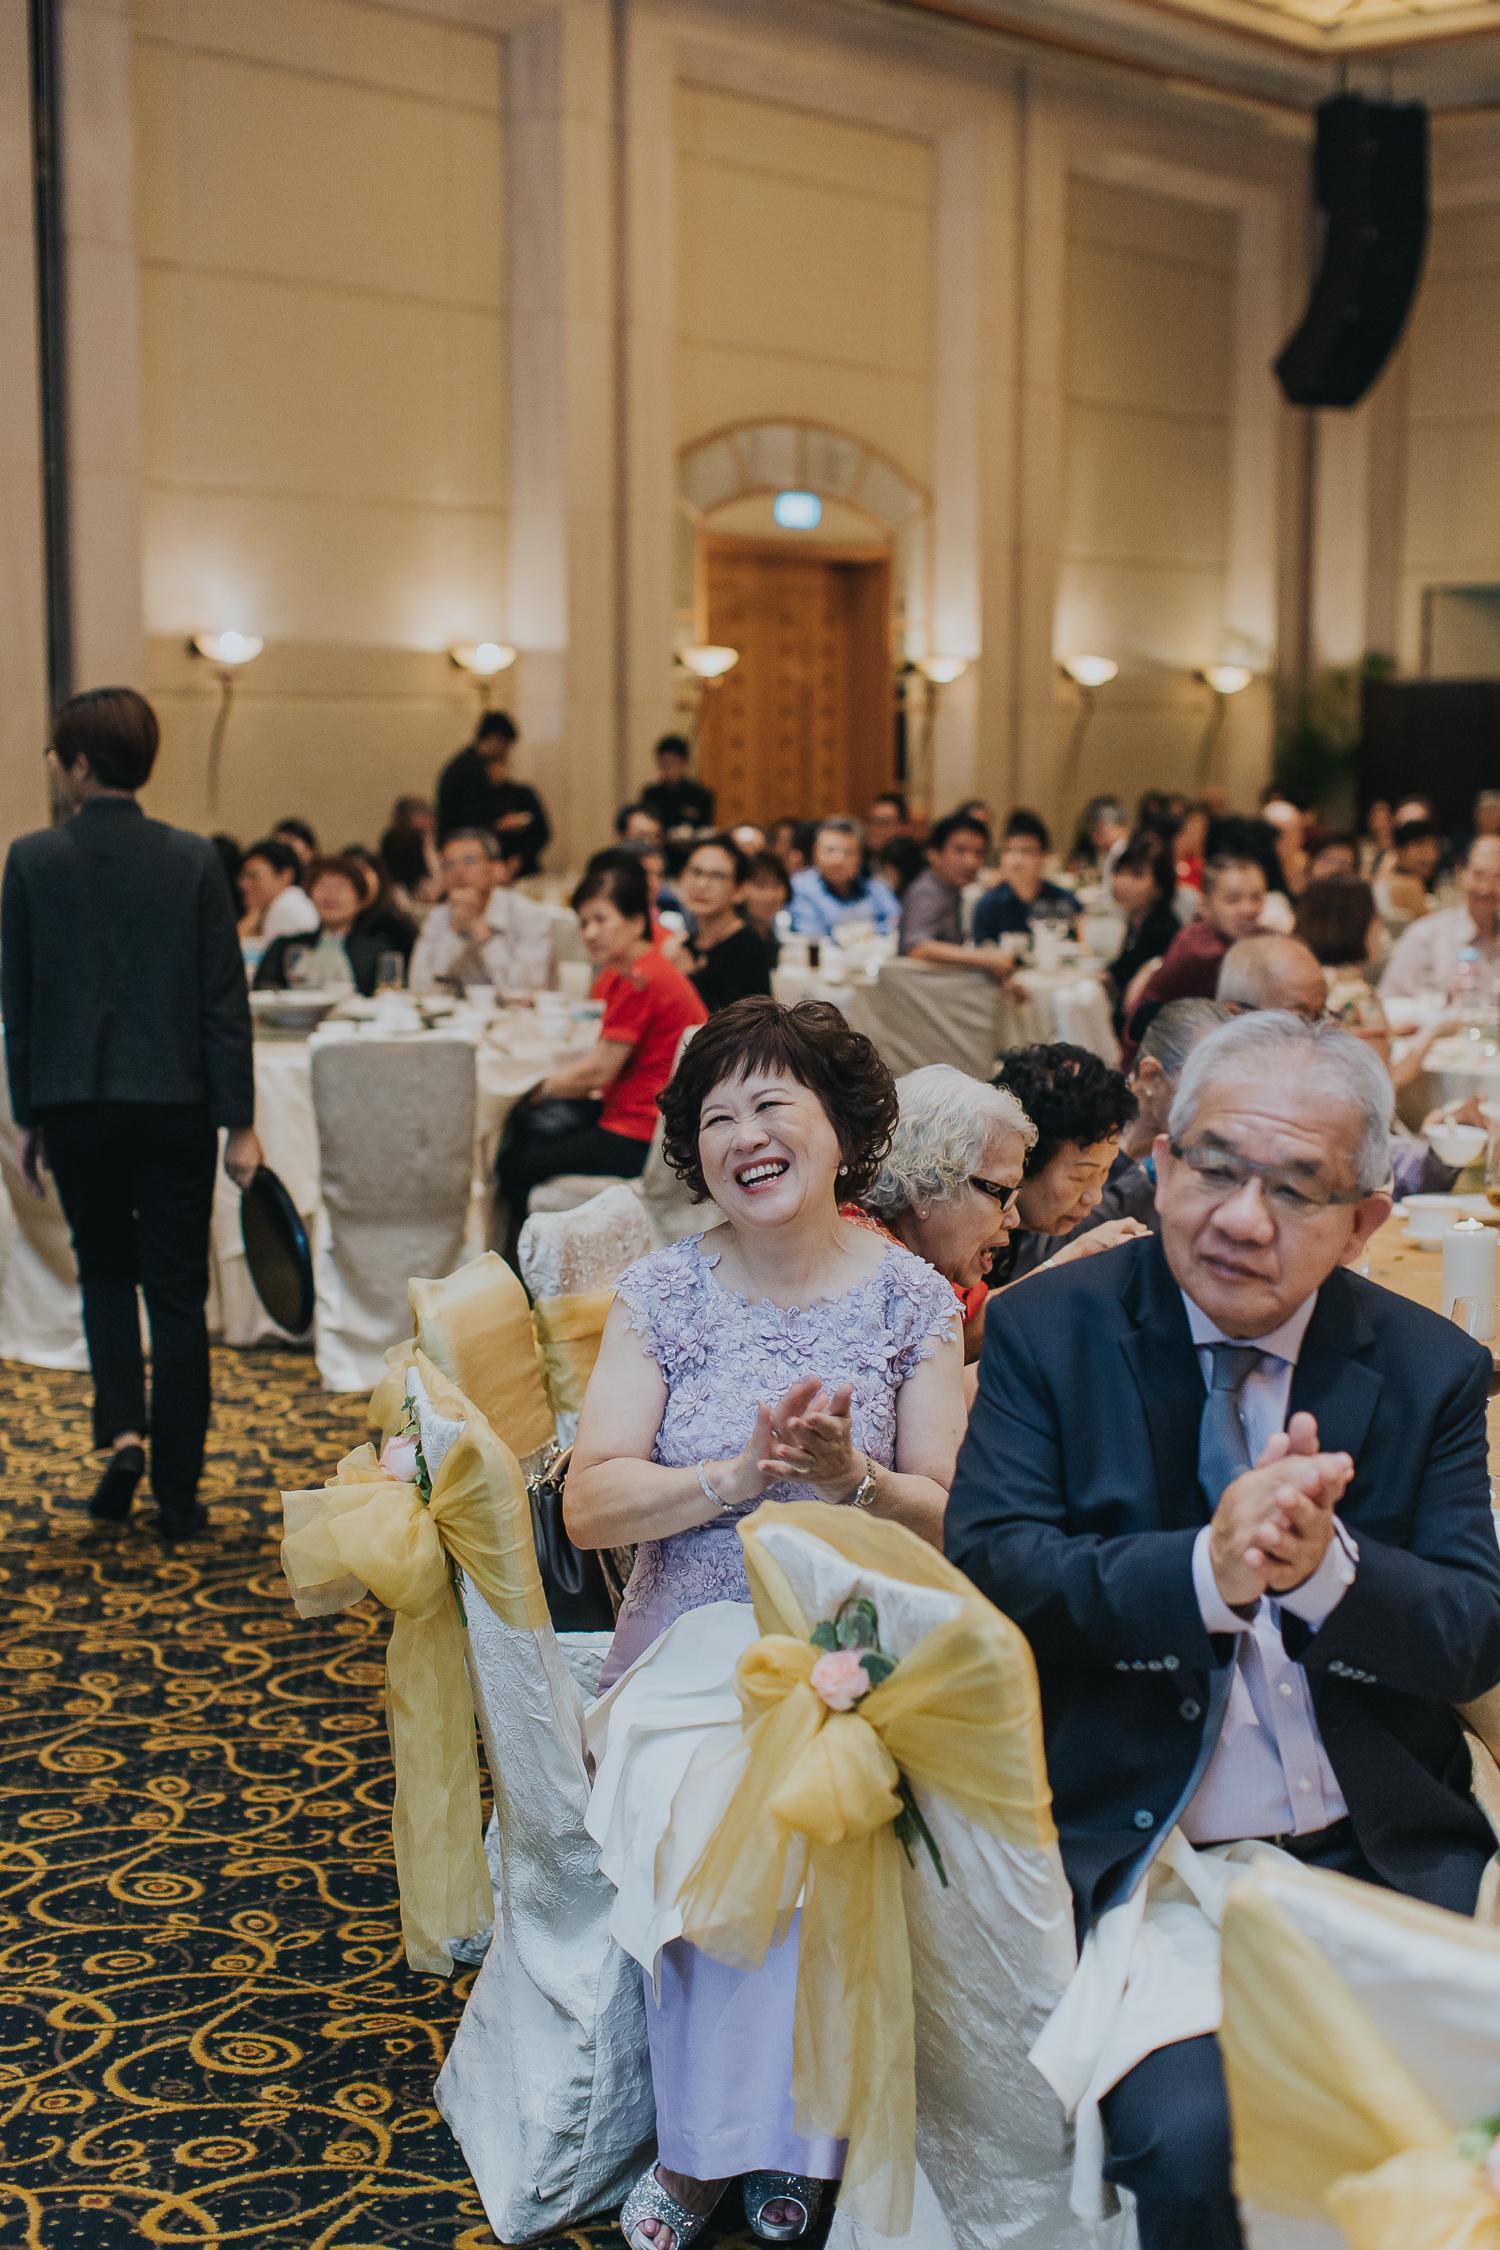 Singapore+Actual+Day+Wedding+Photographer+Grand+Mercure+Oliver+Estelle-0110.jpg